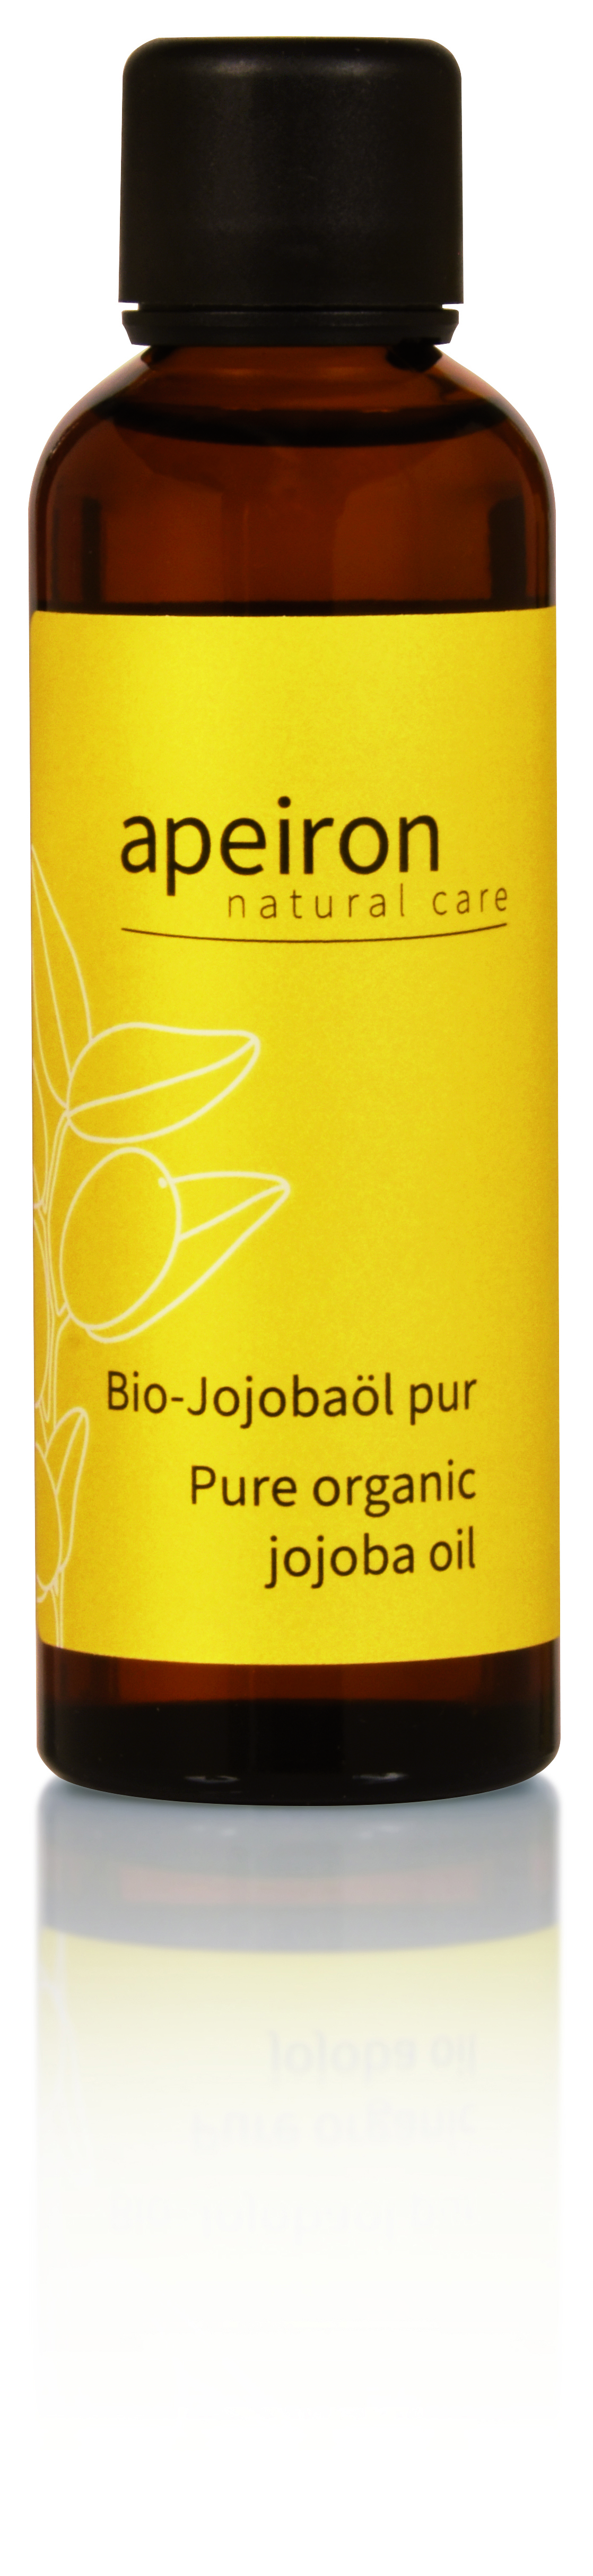 Bio-Jojobaöl pur